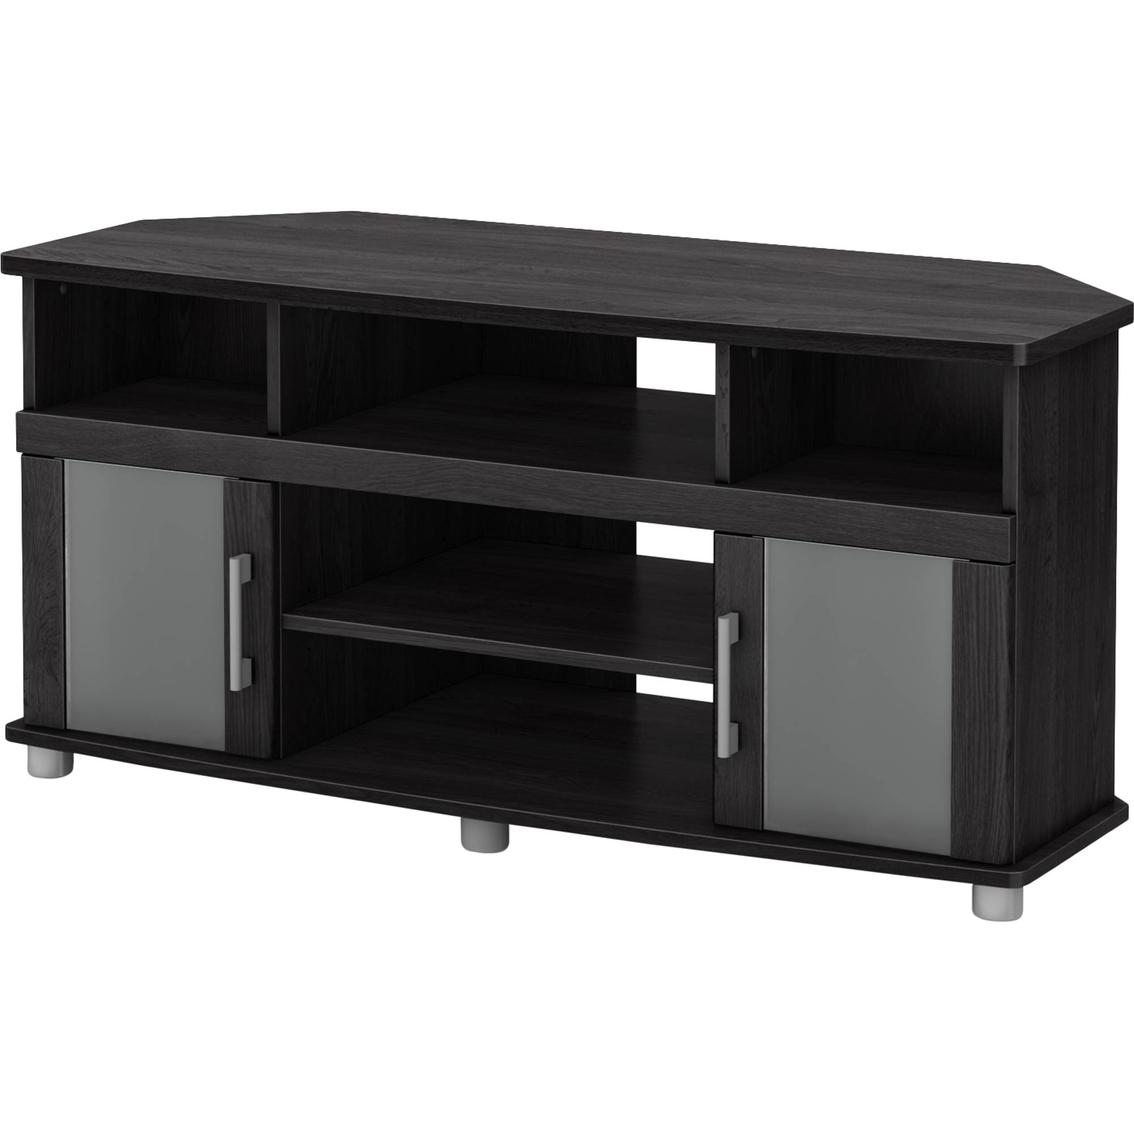 South Shore City Life Corner Tv Stand Media Furniture Home